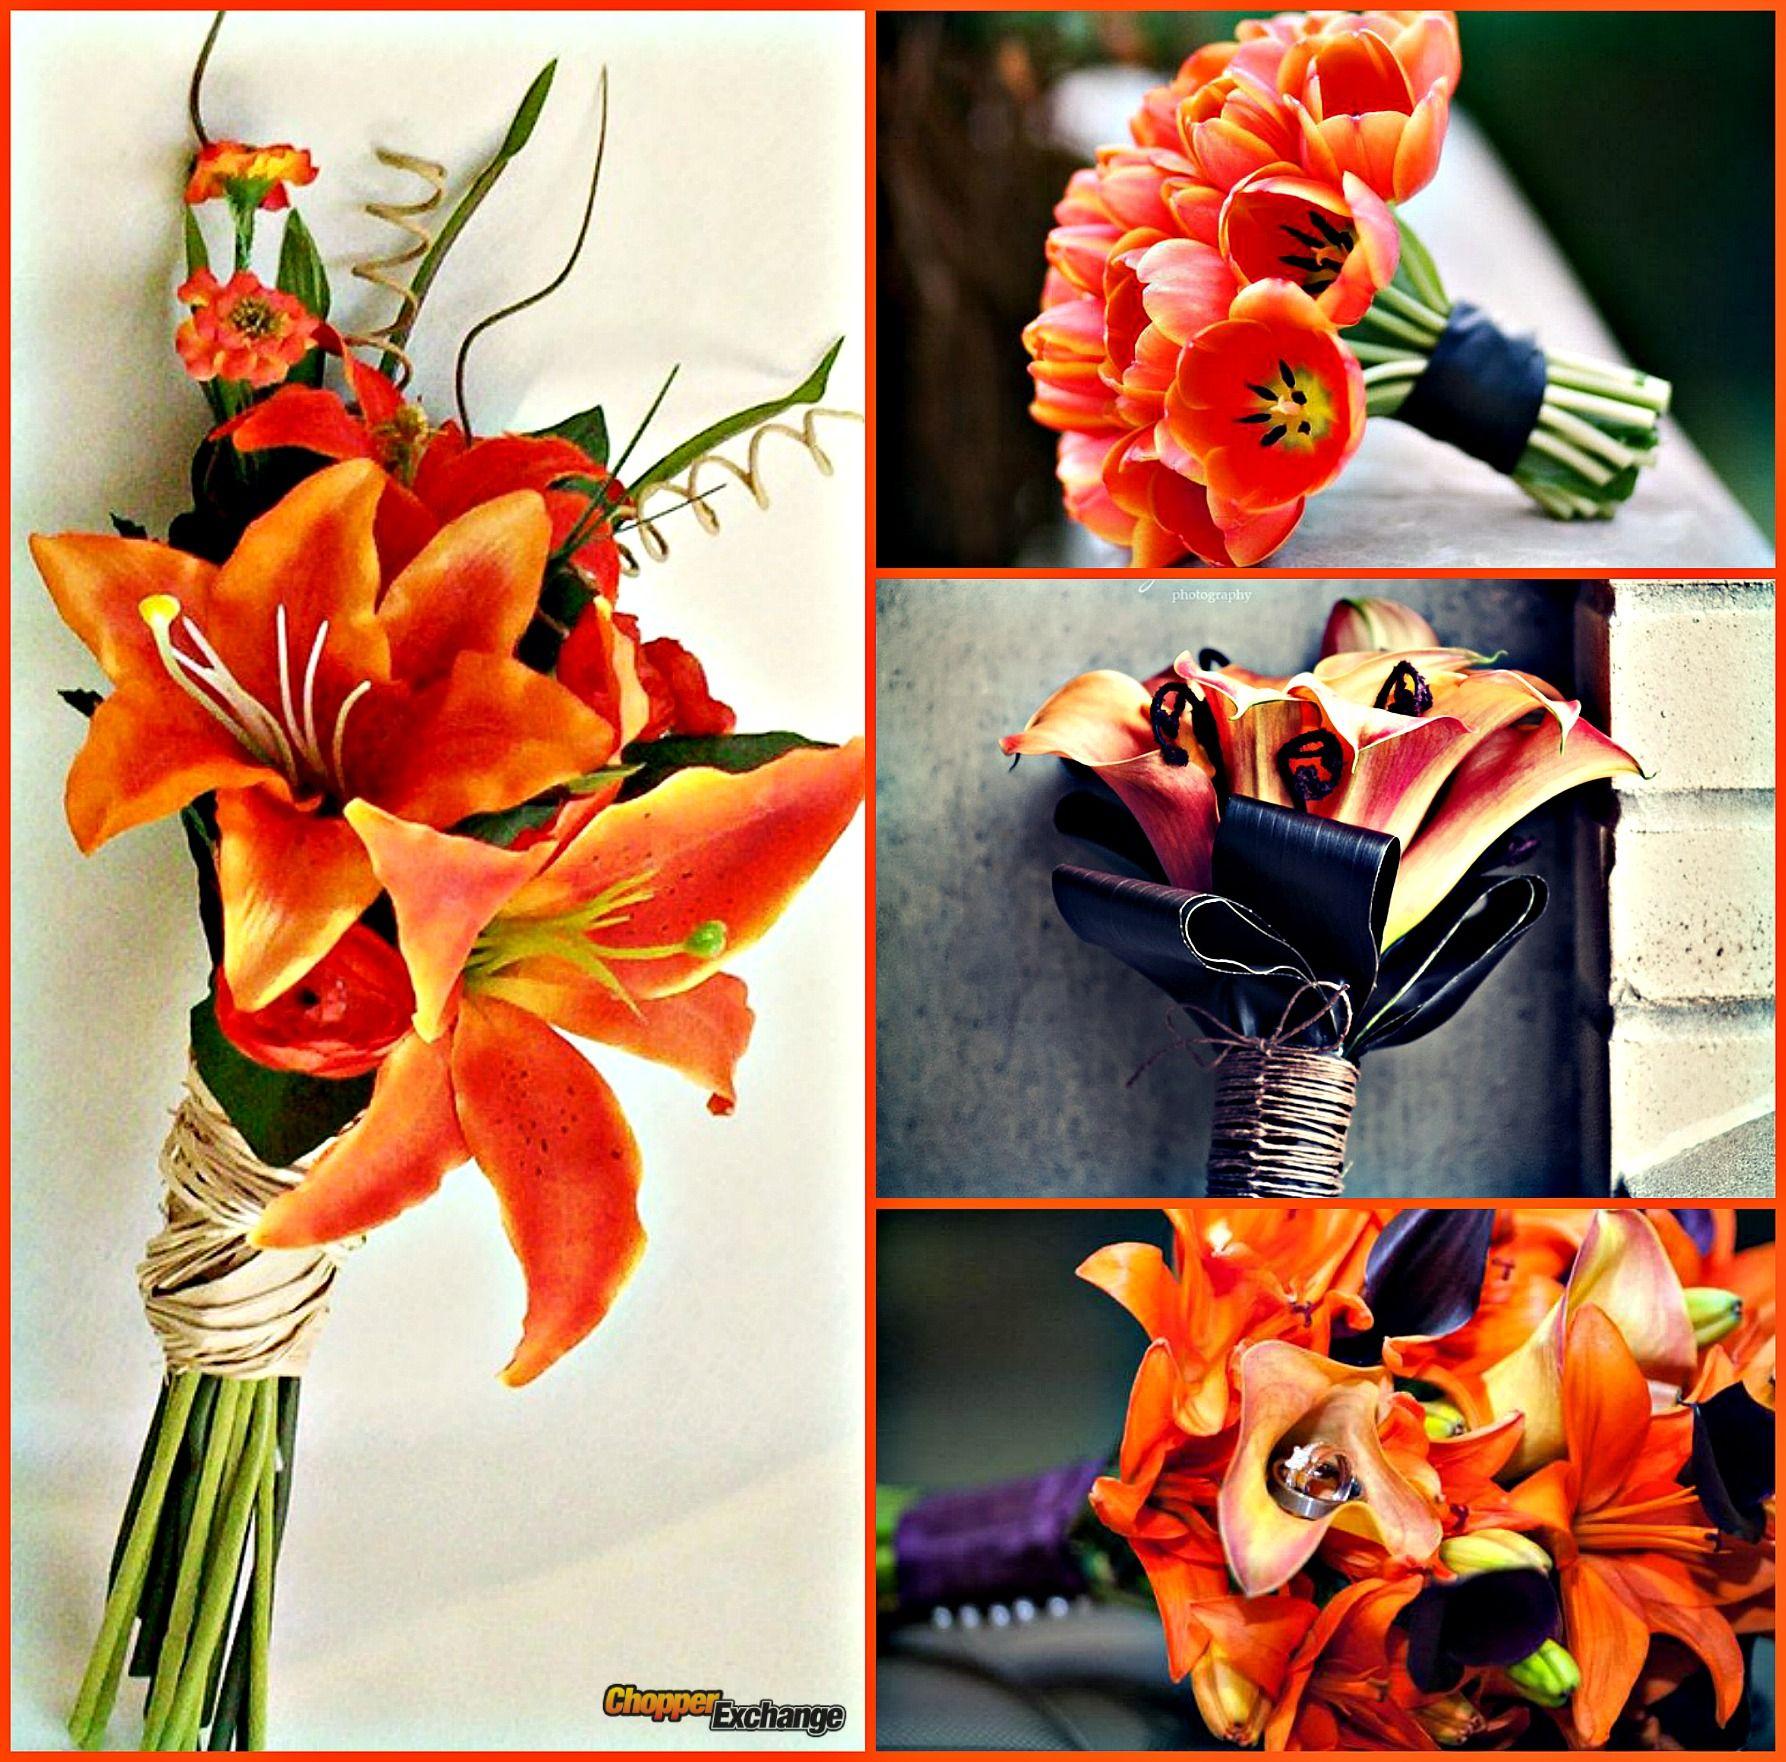 Destination Wedding Flowers Orange Tiger Lily Bridal